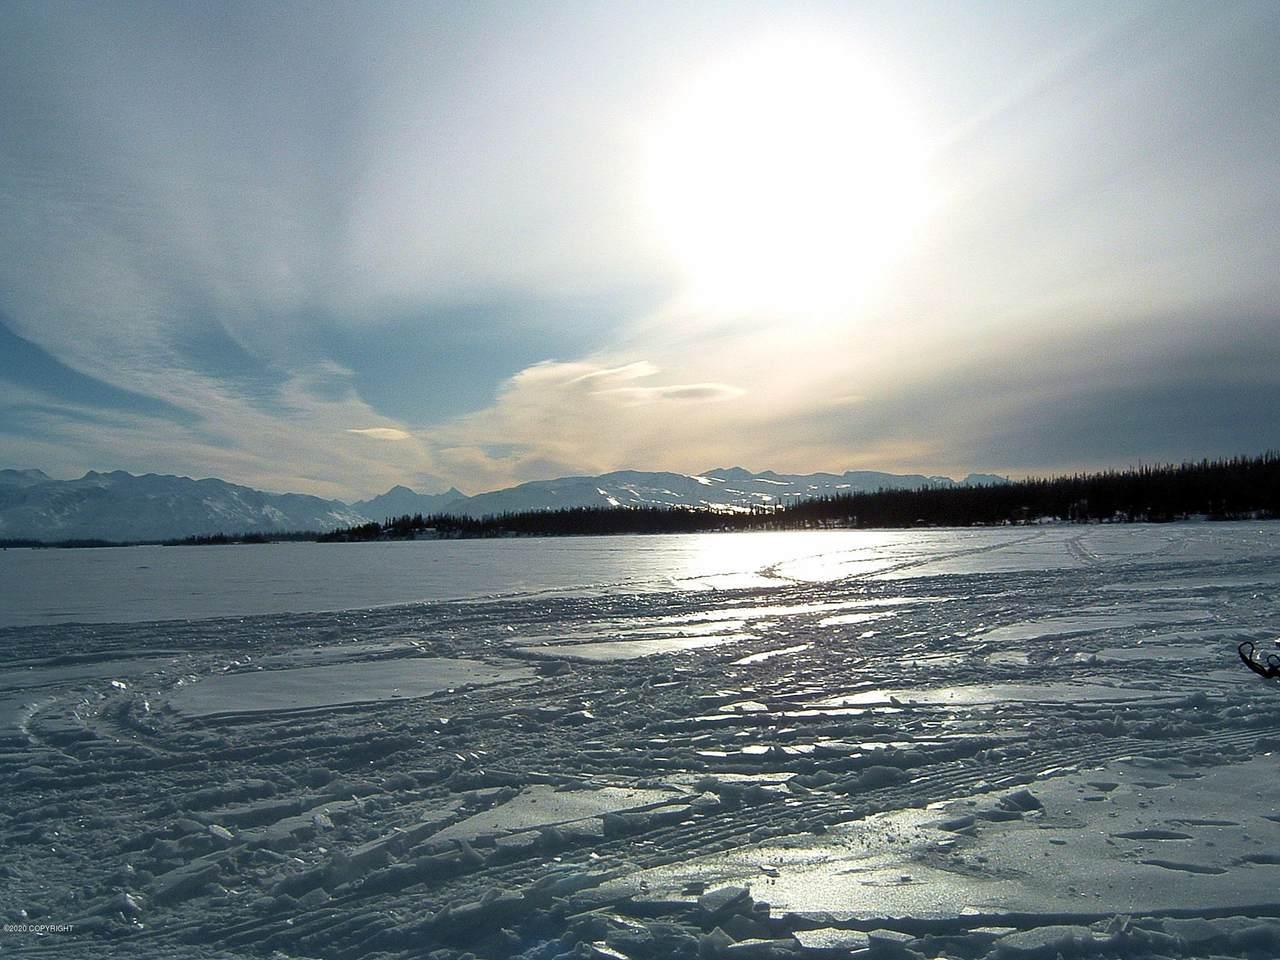 https://bt-photos.global.ssl.fastly.net/alaska/1280_boomver_2_20-12742-2.jpg